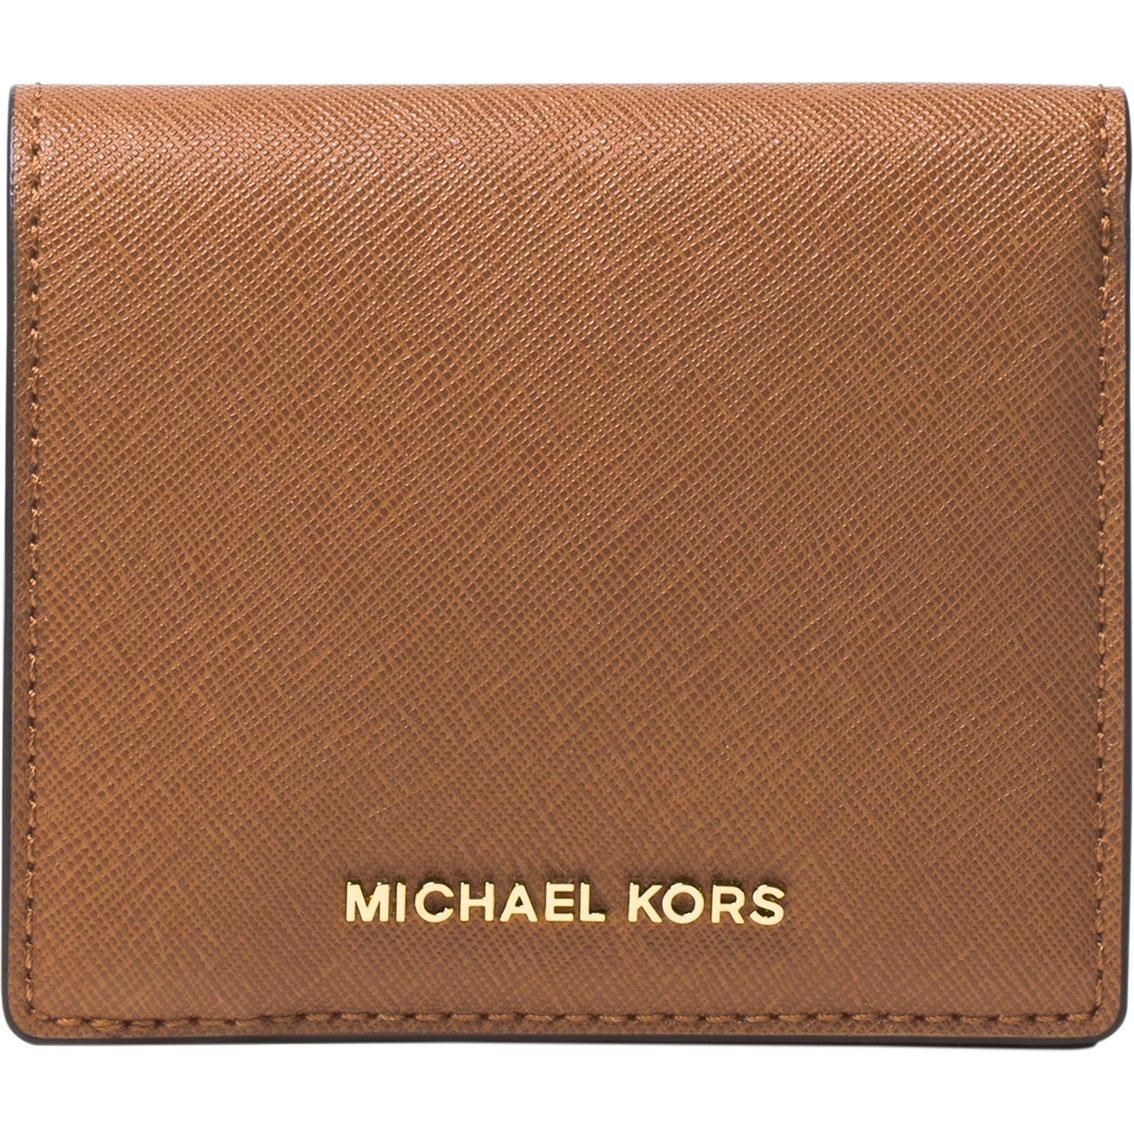 92ff7bf13dfc Michael Kors Jet Set Travel Leather Carryall Card Case | Wallets ...